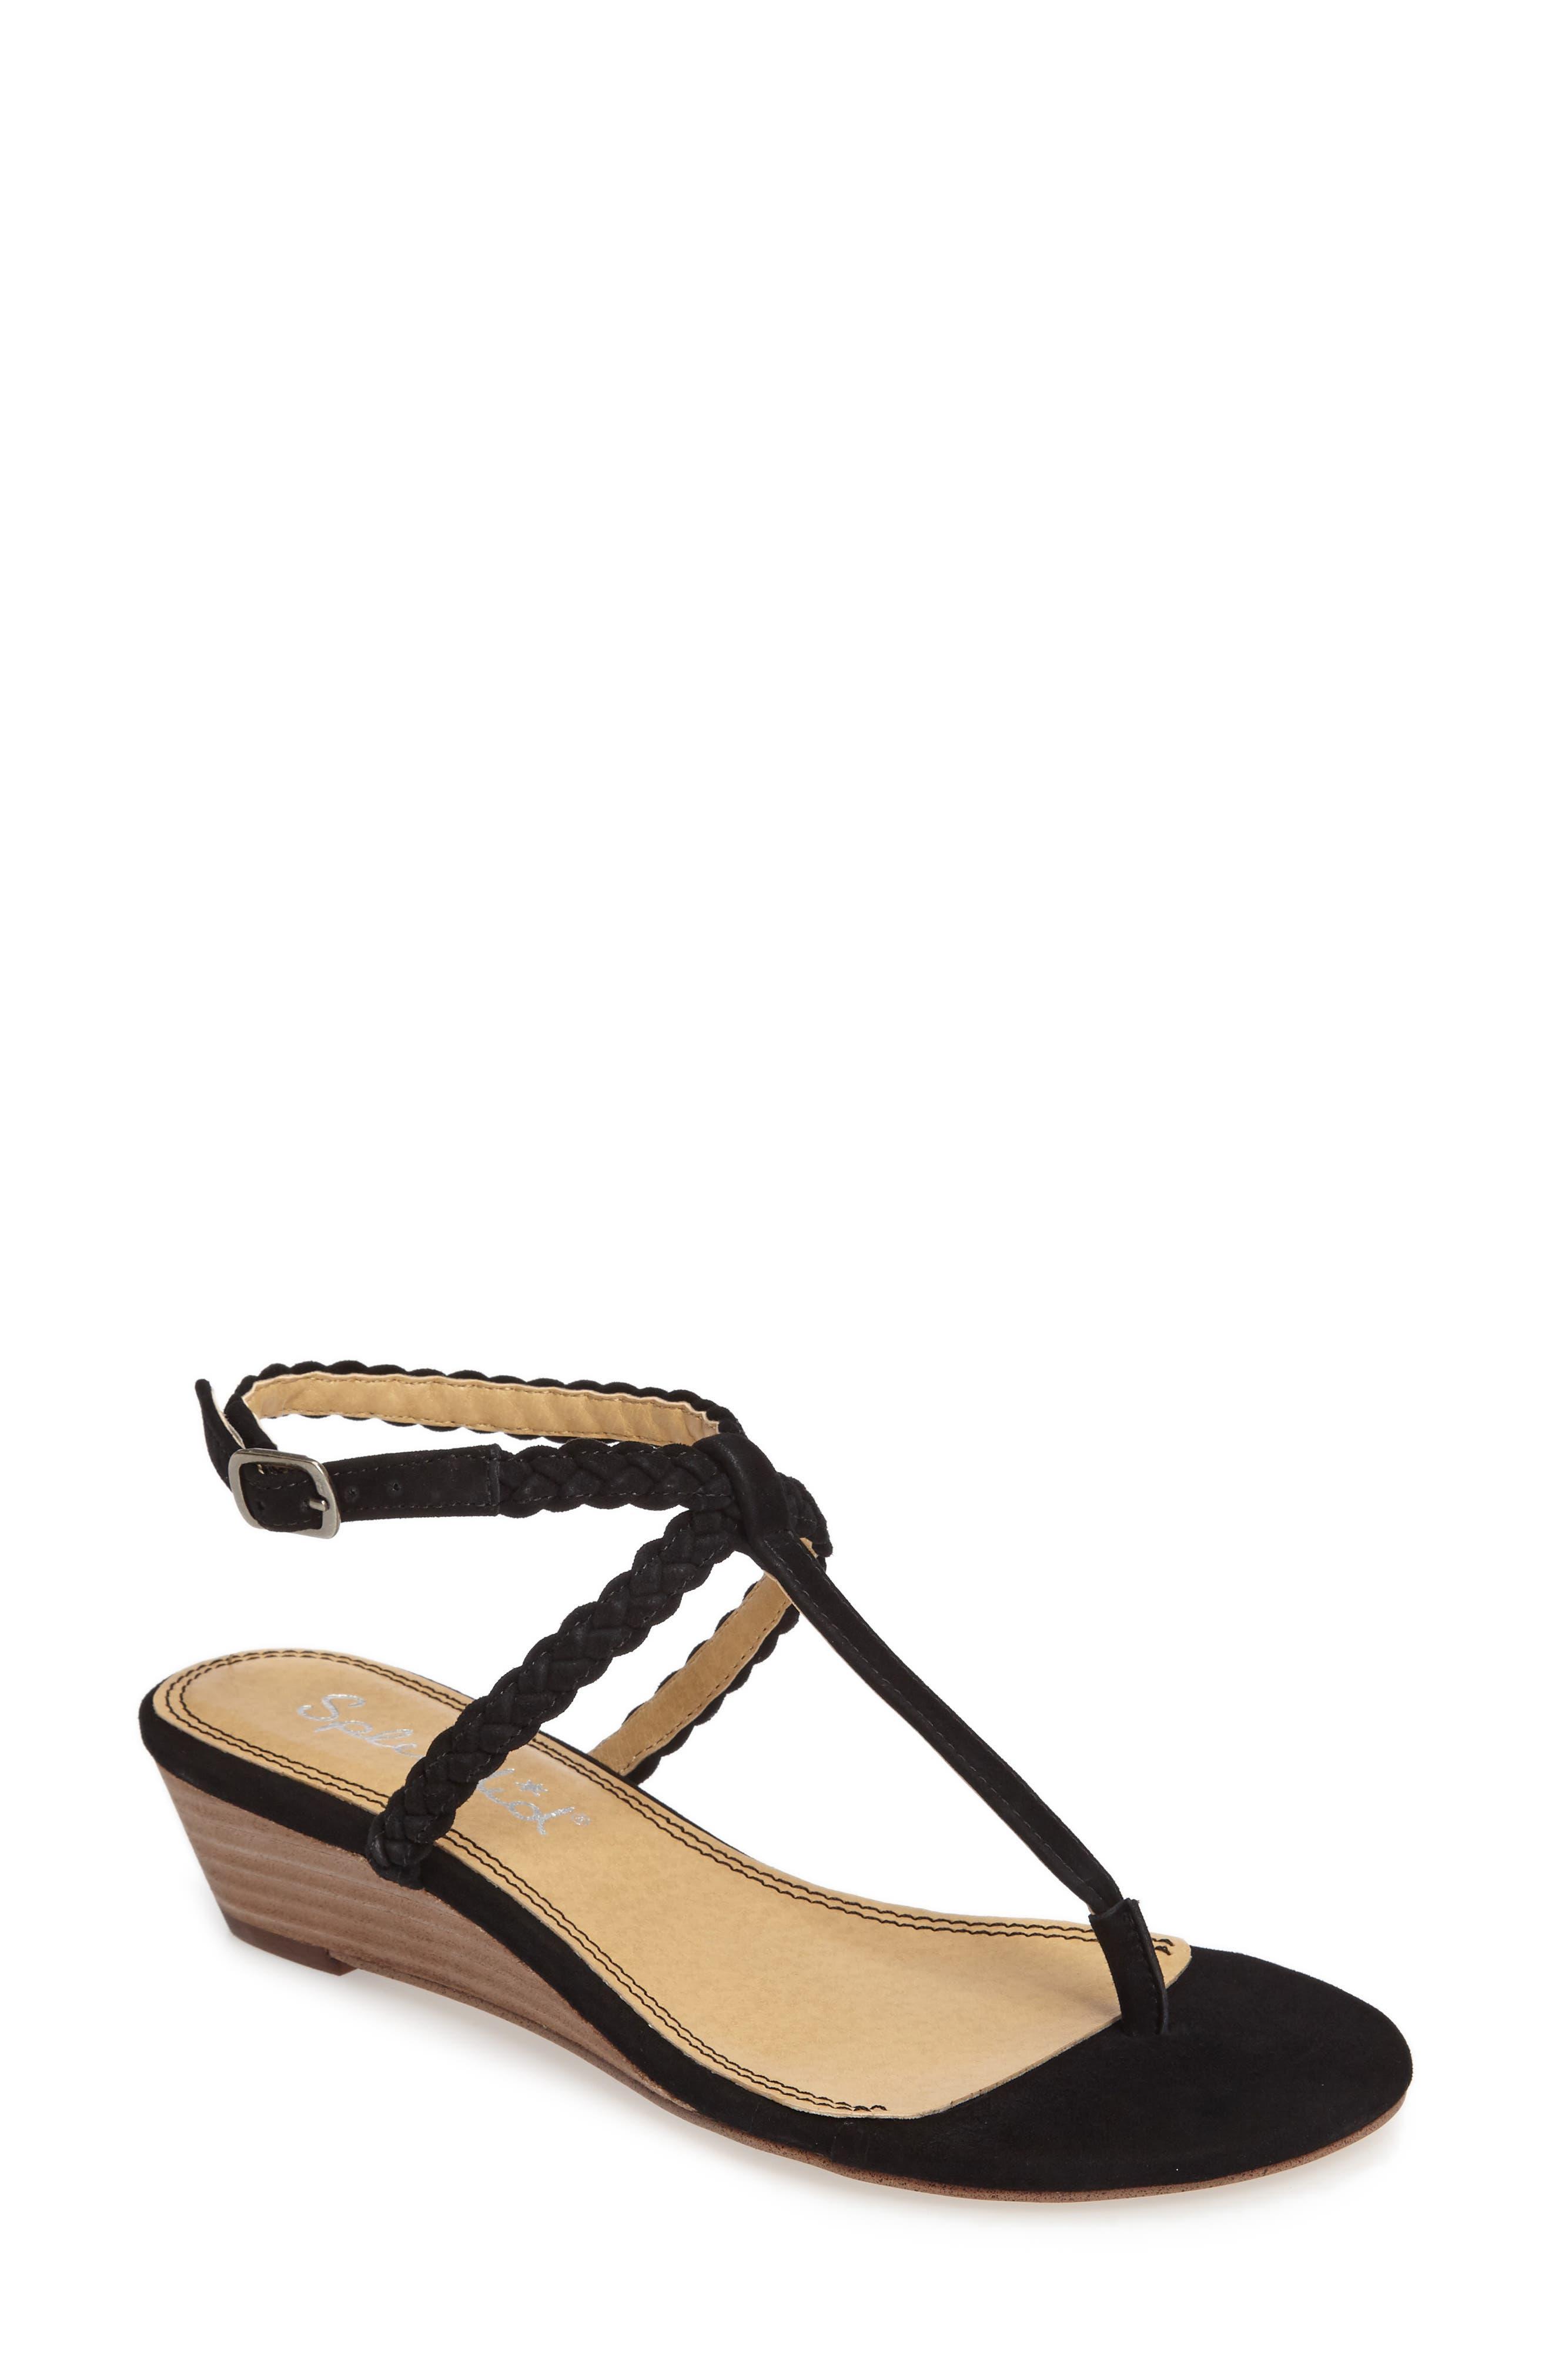 Main Image - Splendid Jadia T-Strap Sandal (Women)